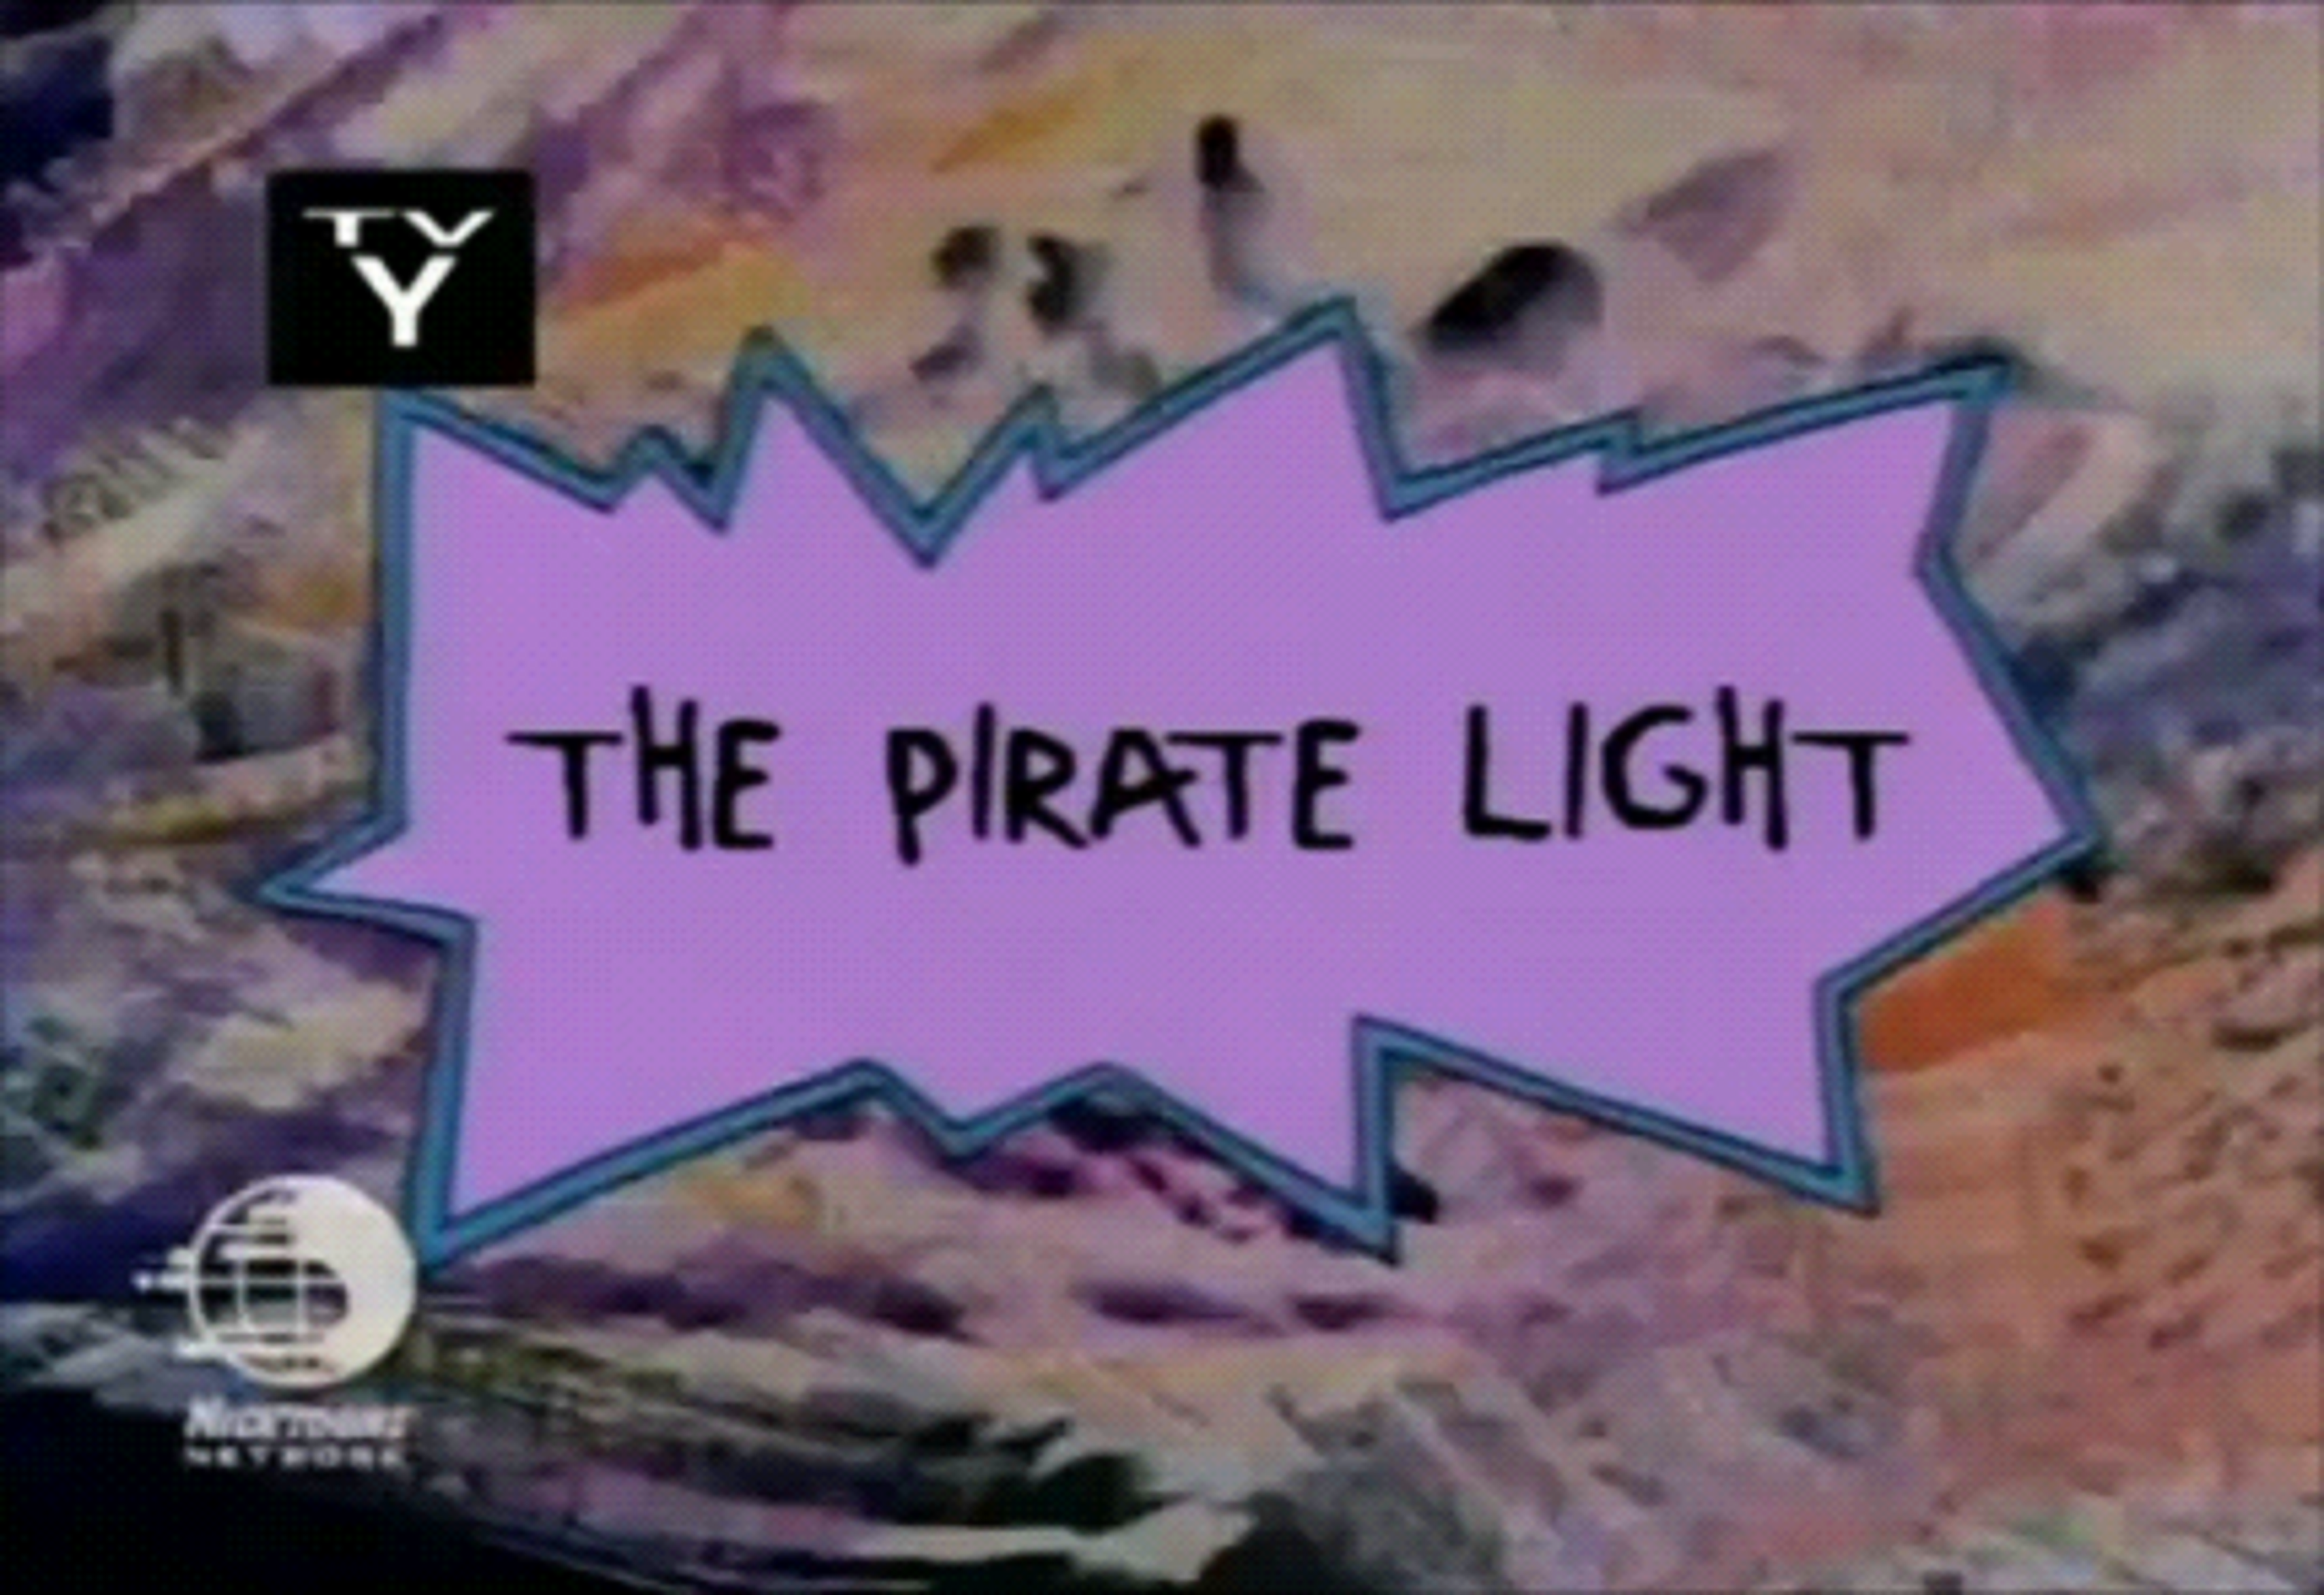 The Pirate Light